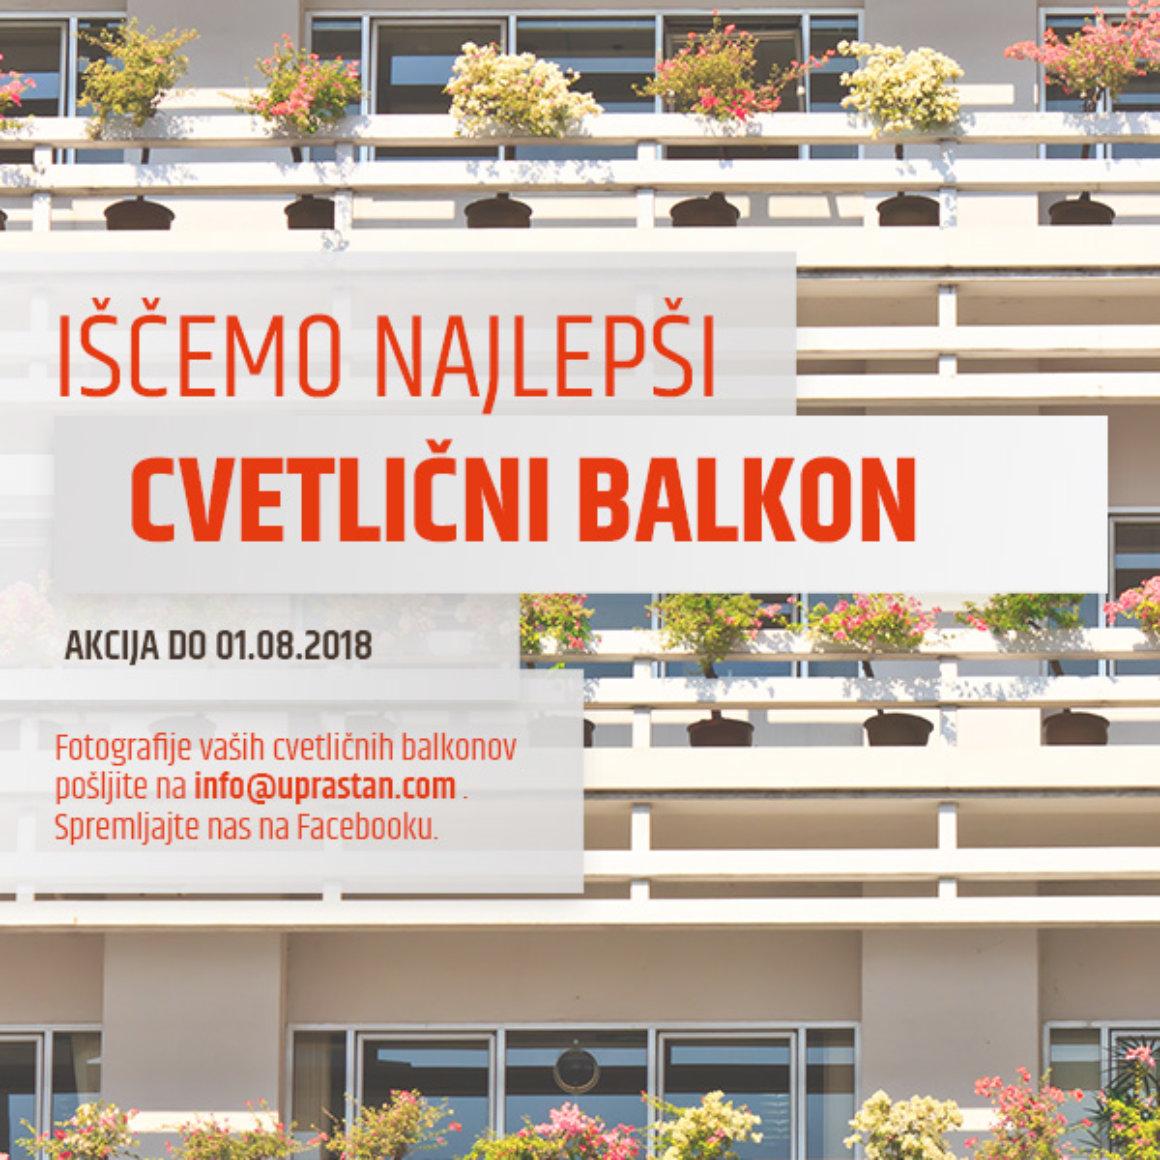 Uprastan-poloznice-julij-cvetlicni balkoni-Mailchimp